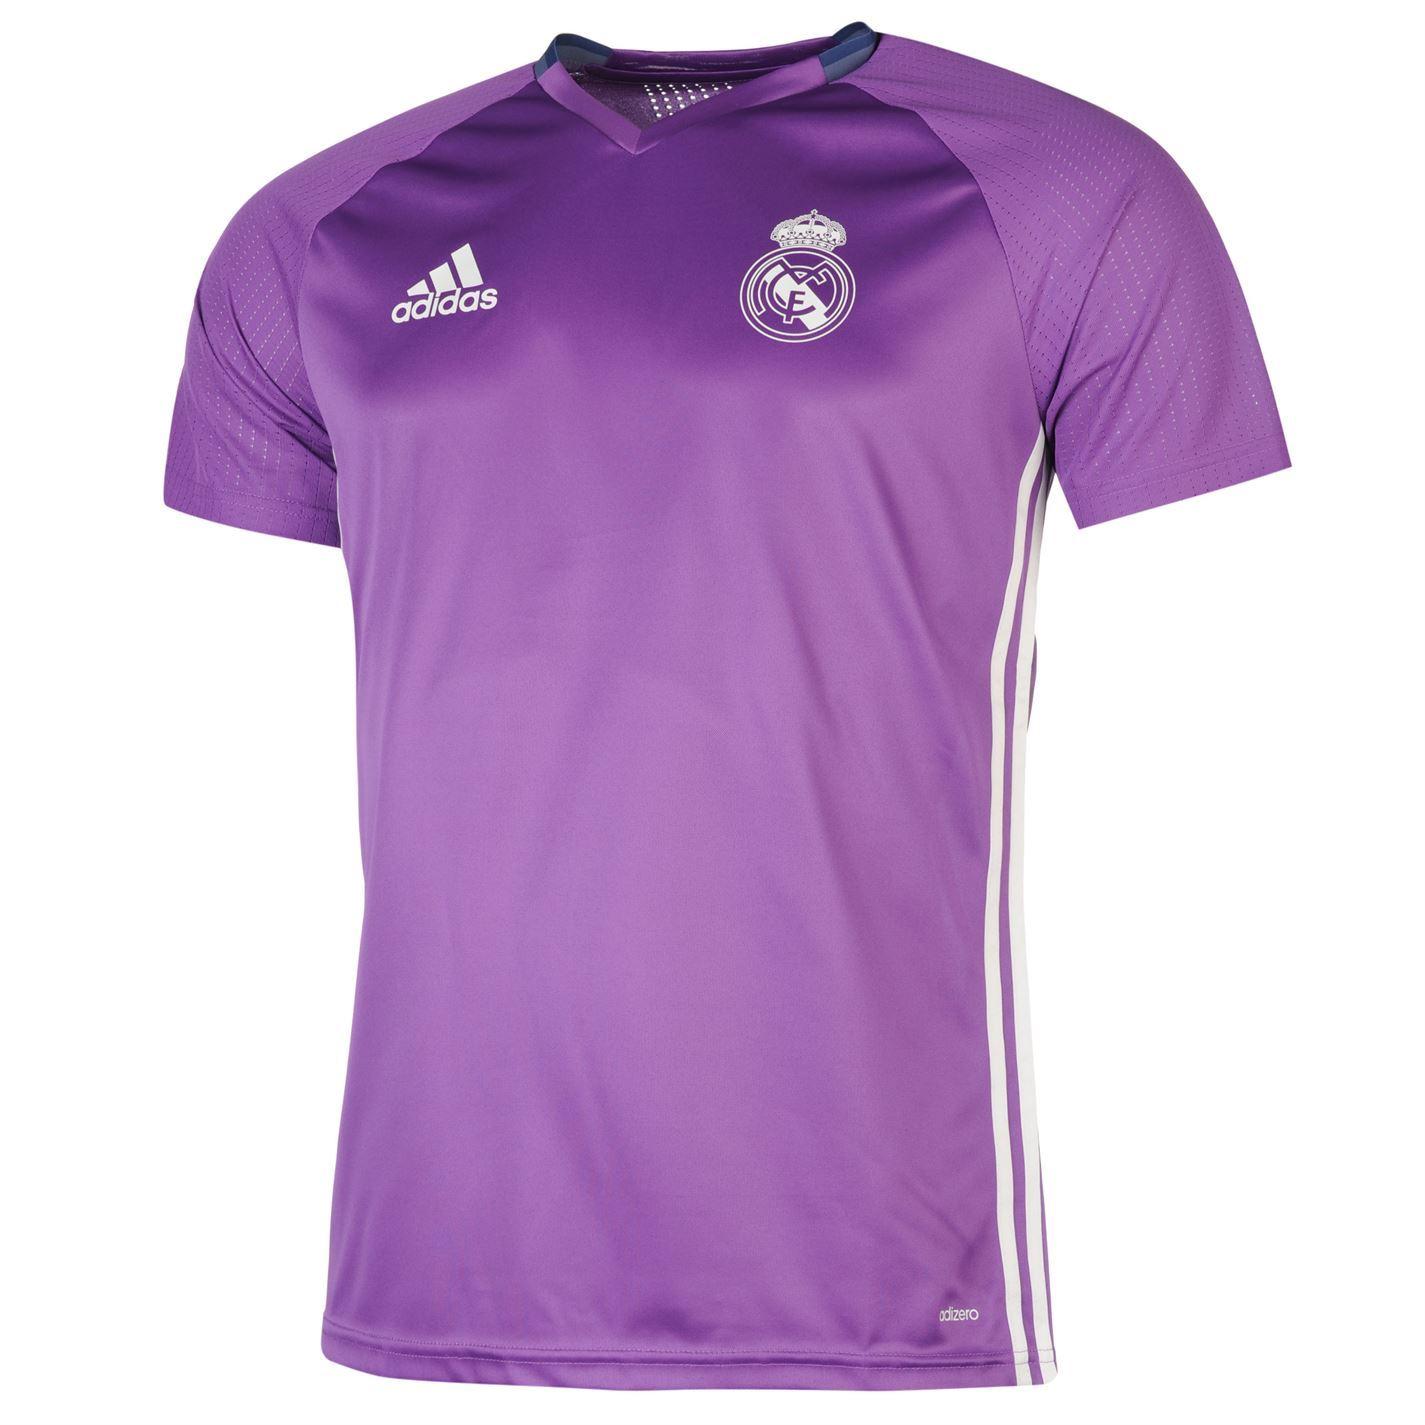 Adidas Real Madrid Training Jersey Mens Purple Football Soccer Top Shirt 9a5d40ecb